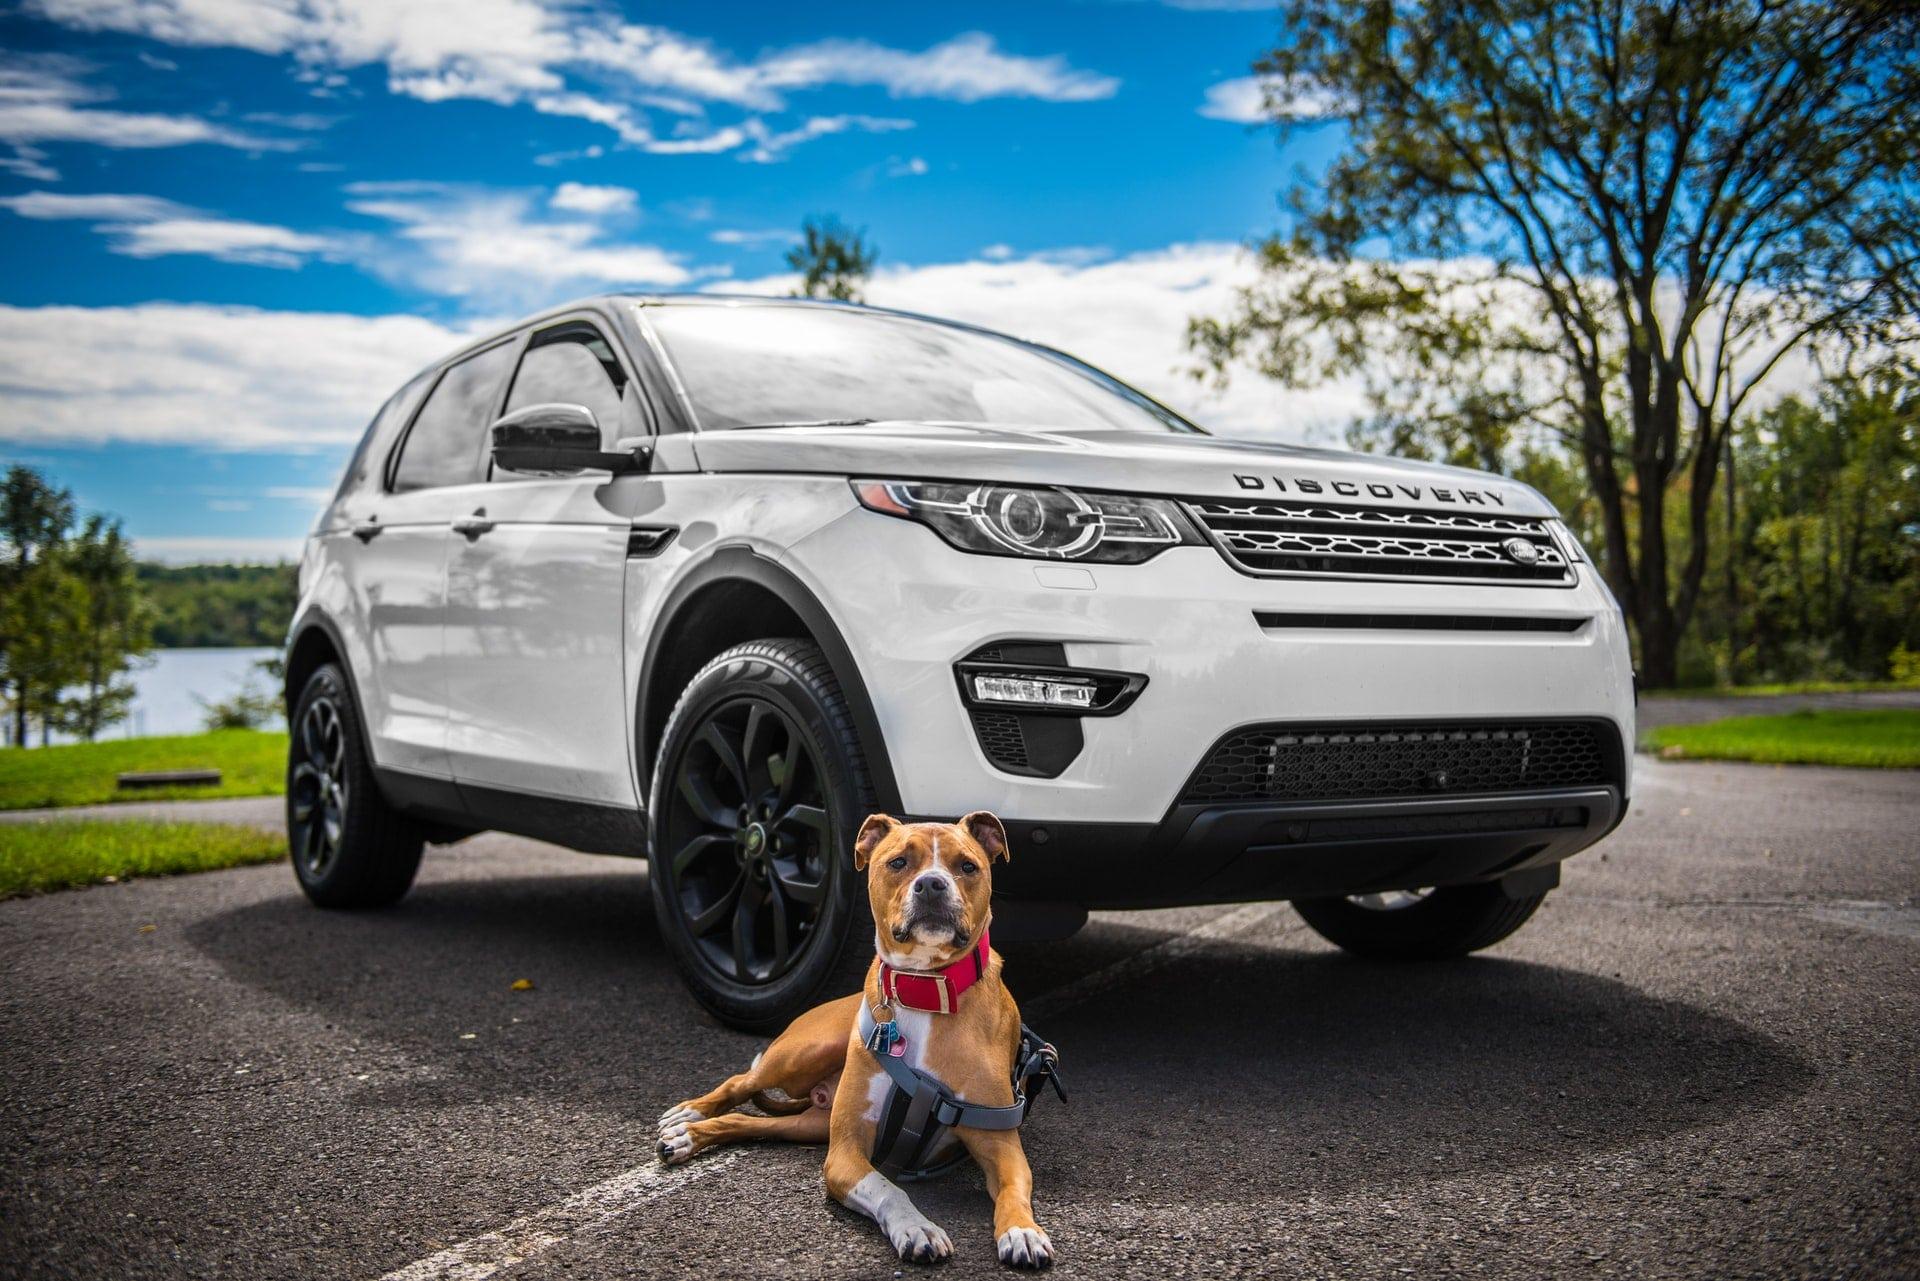 transporte de mascotas en coche